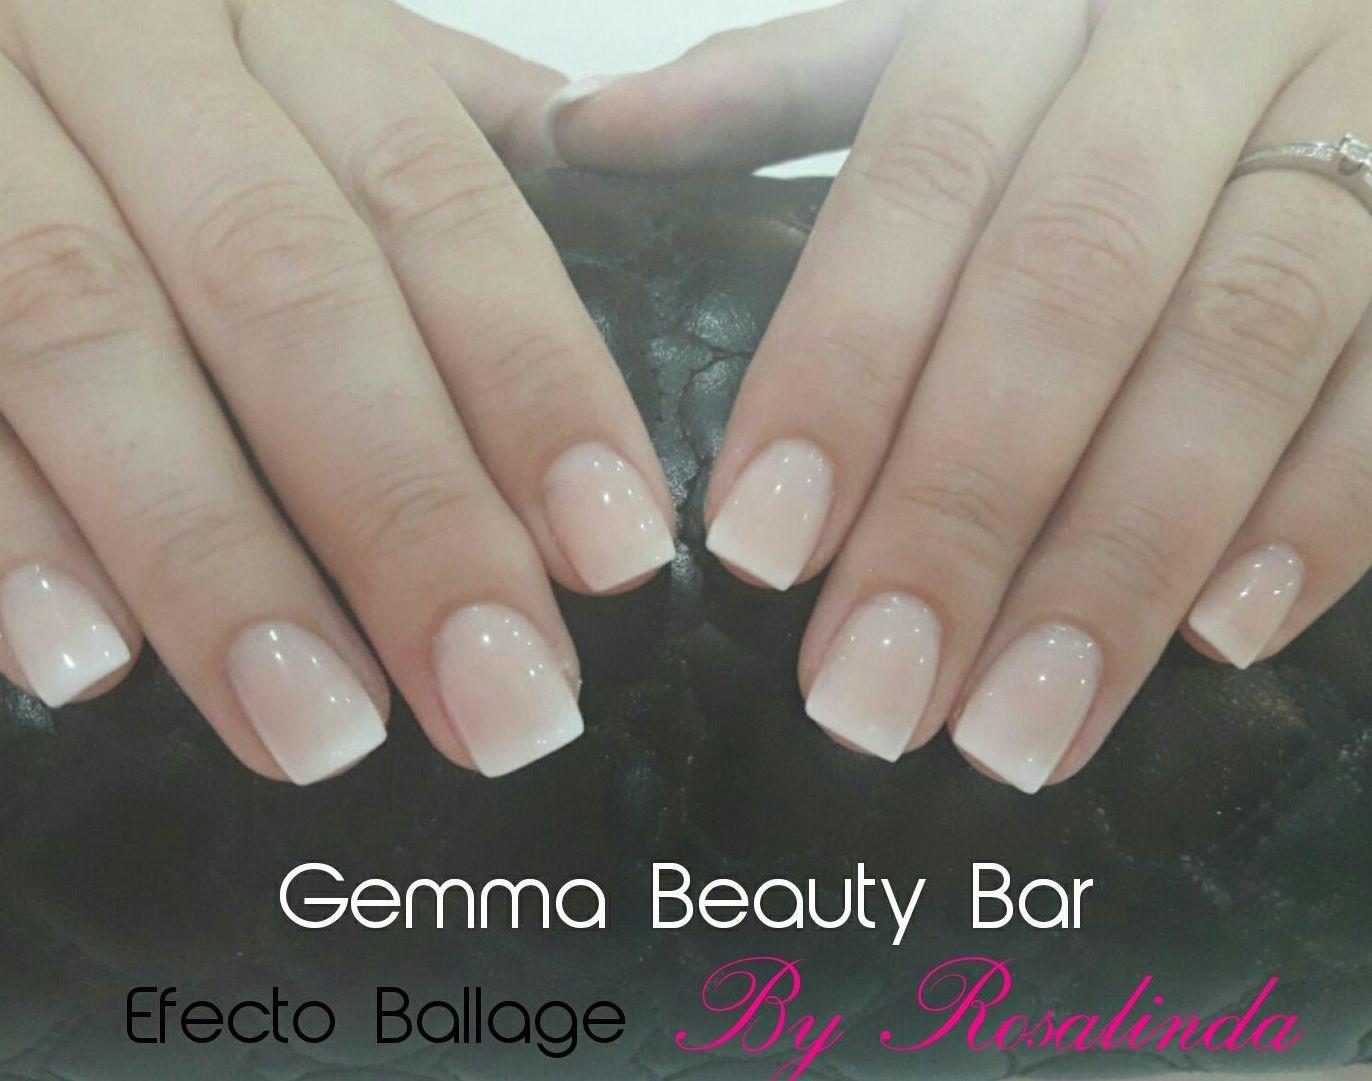 Foto 46 de Centros de estética en Zaragoza | Gemma Beauty Bar